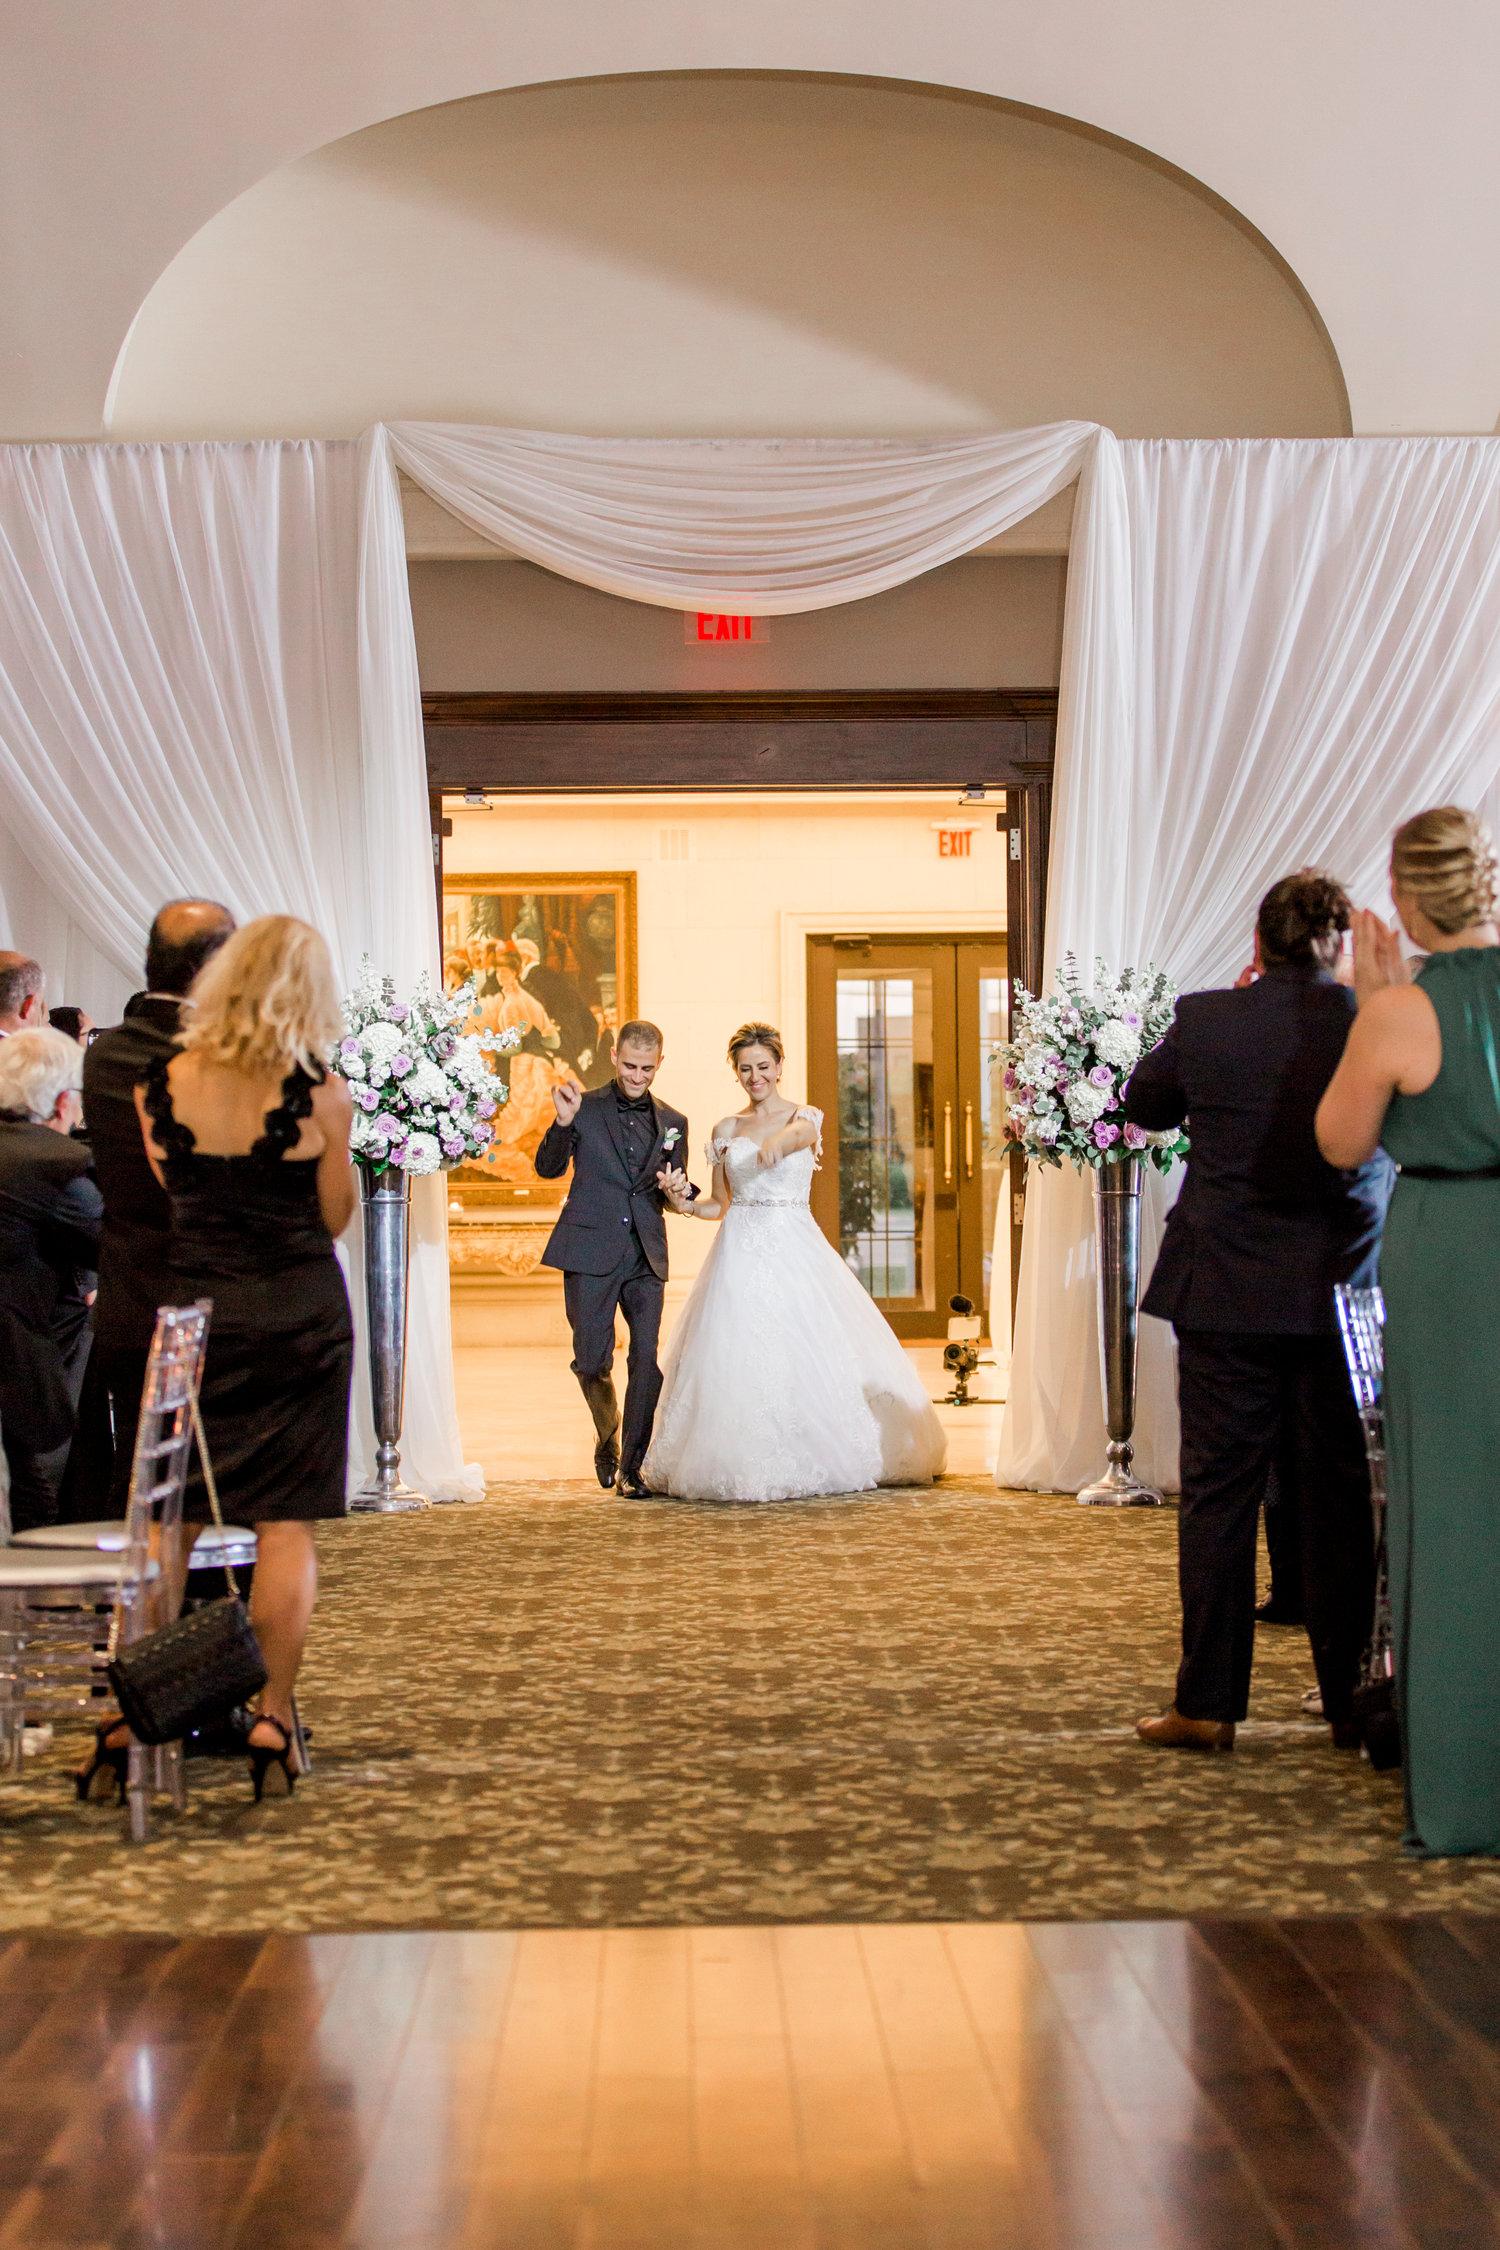 Danielle-Giroux-Amir-Golbazi-Toronto-Wedding-Photographer-Bellvue-Manor_DeLuca_2-328.jpg